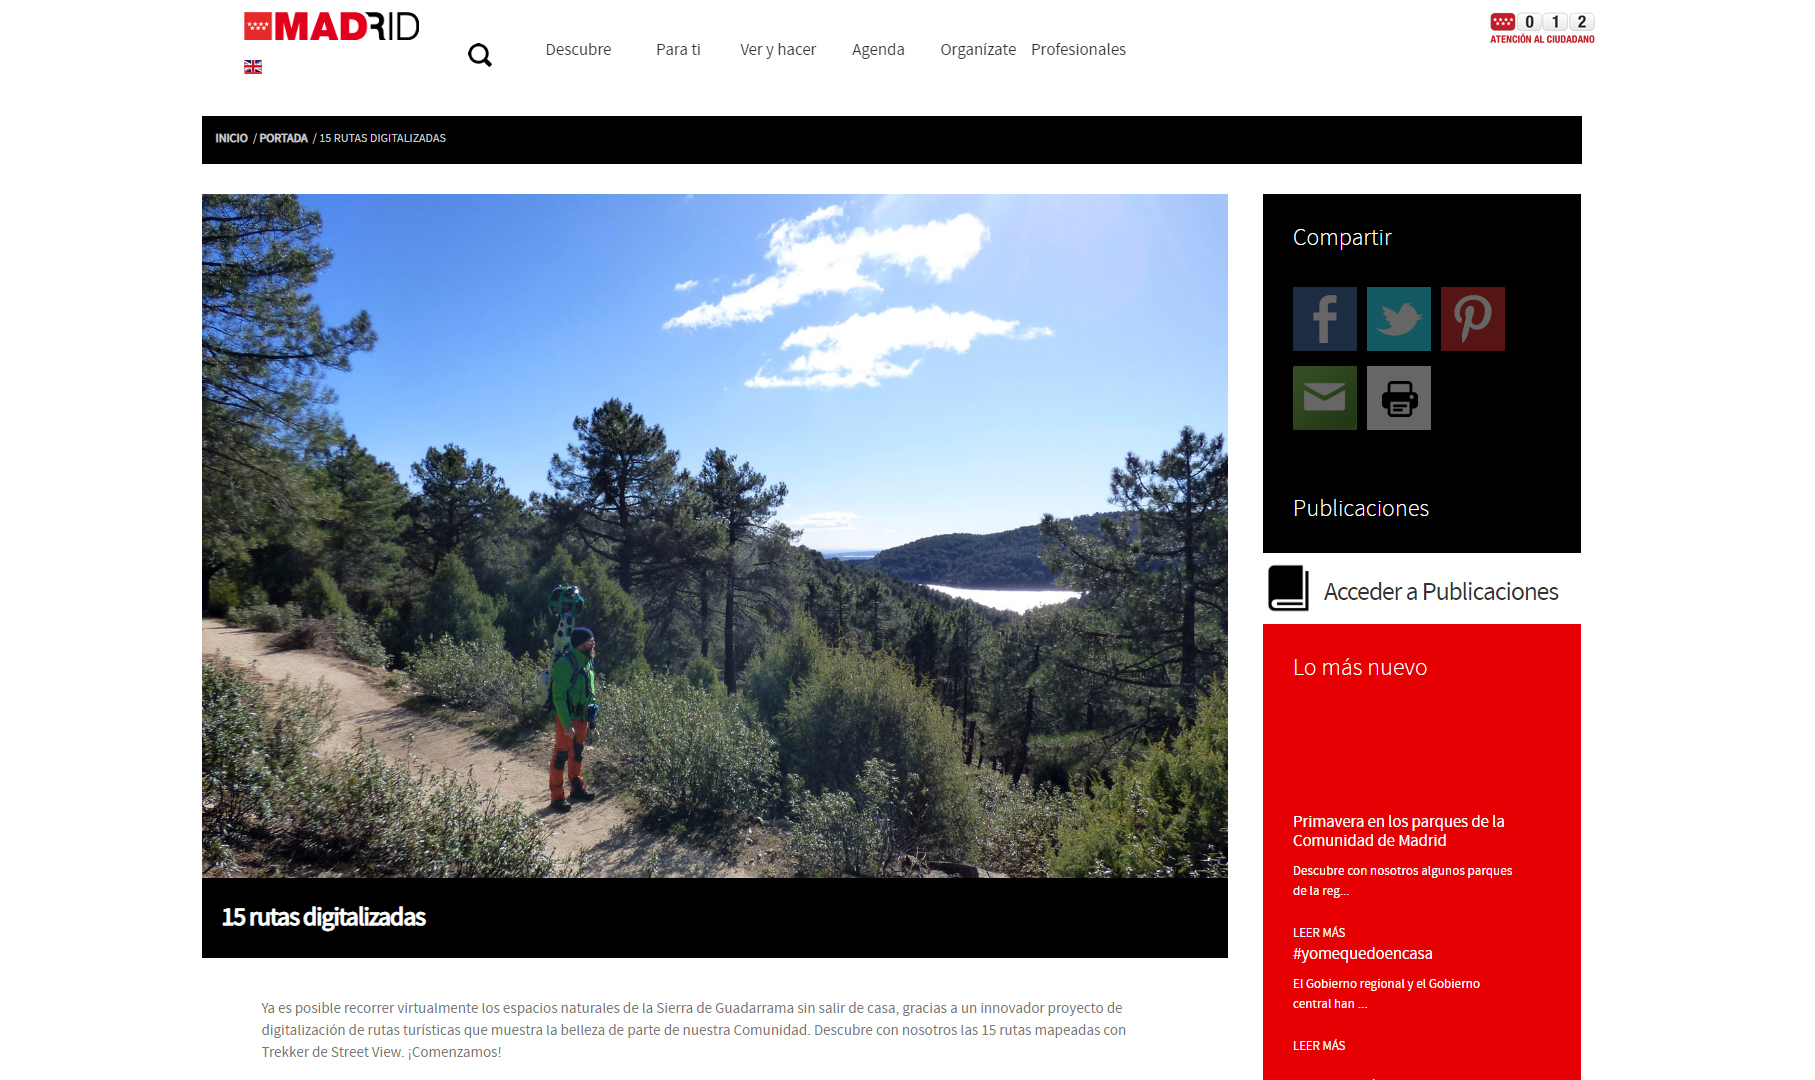 Madrid, 15 rutas digitalizadas